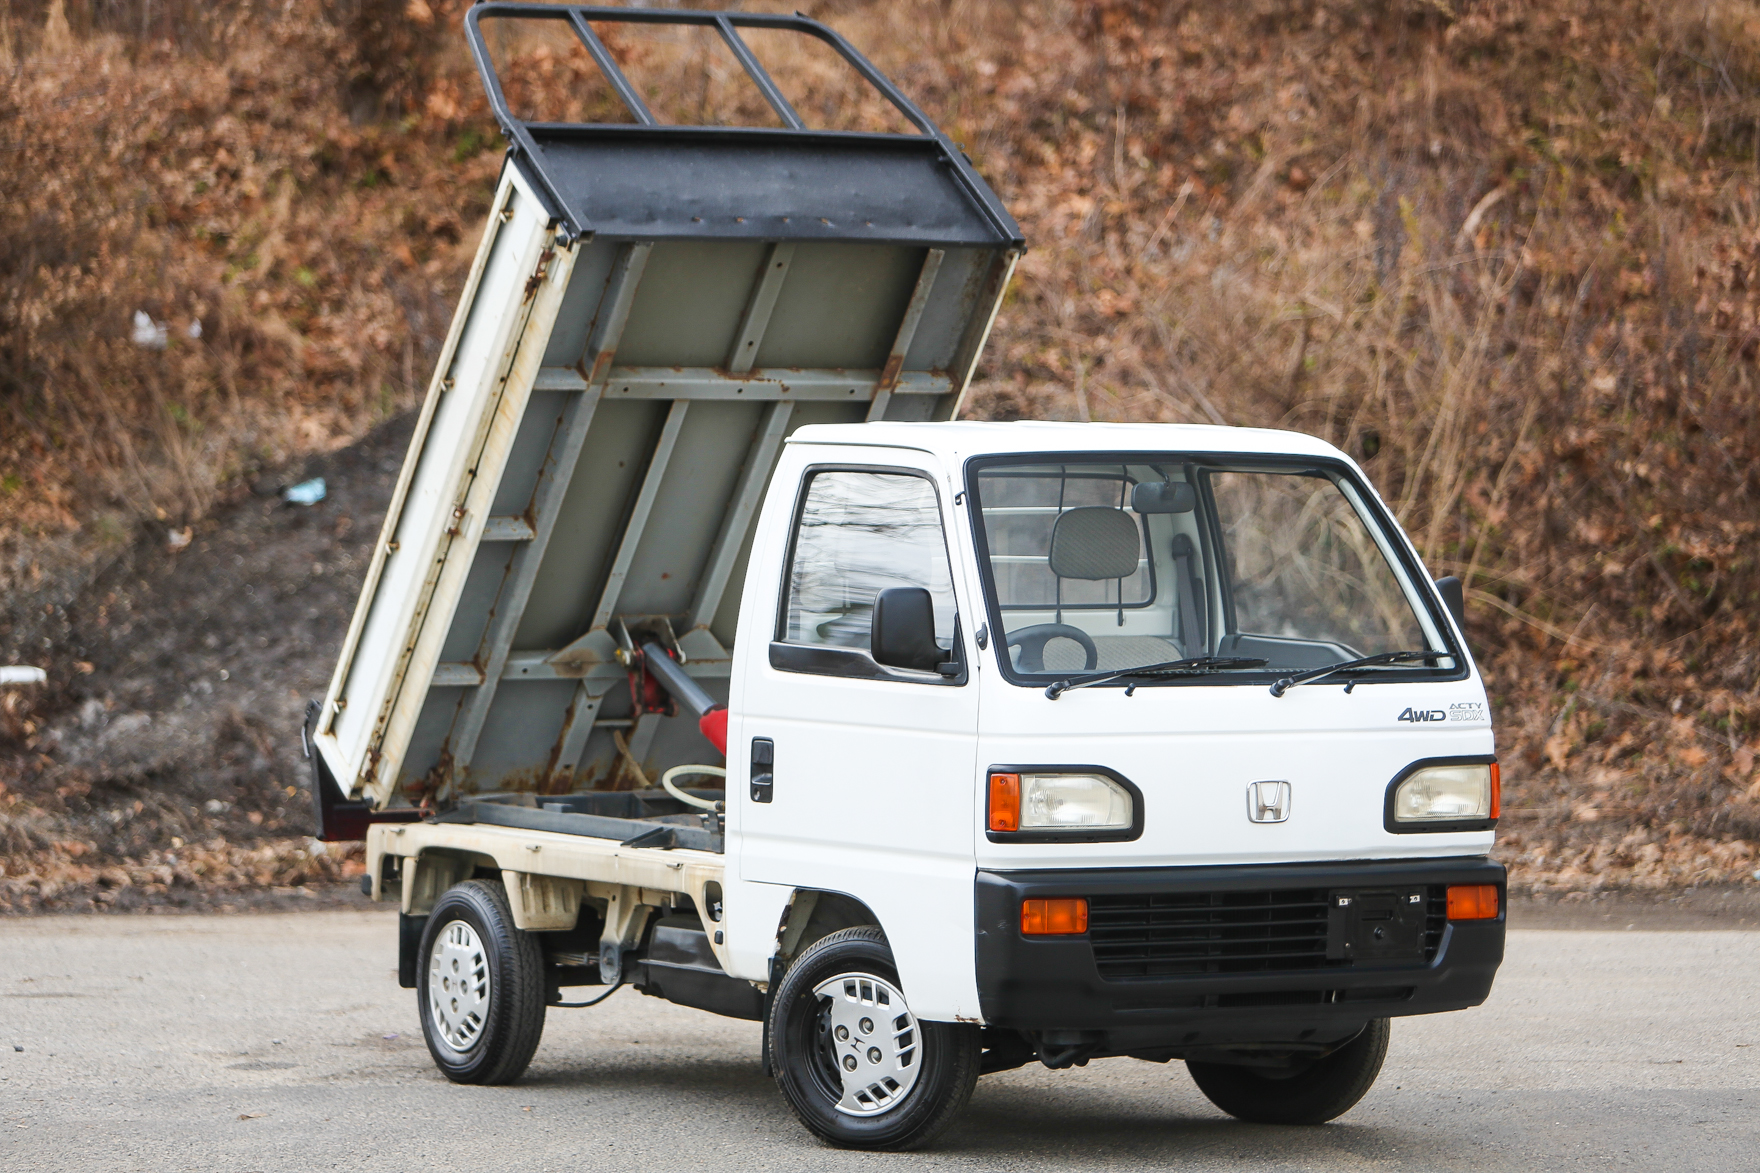 1993 Honda ACTY Dump - $8,350